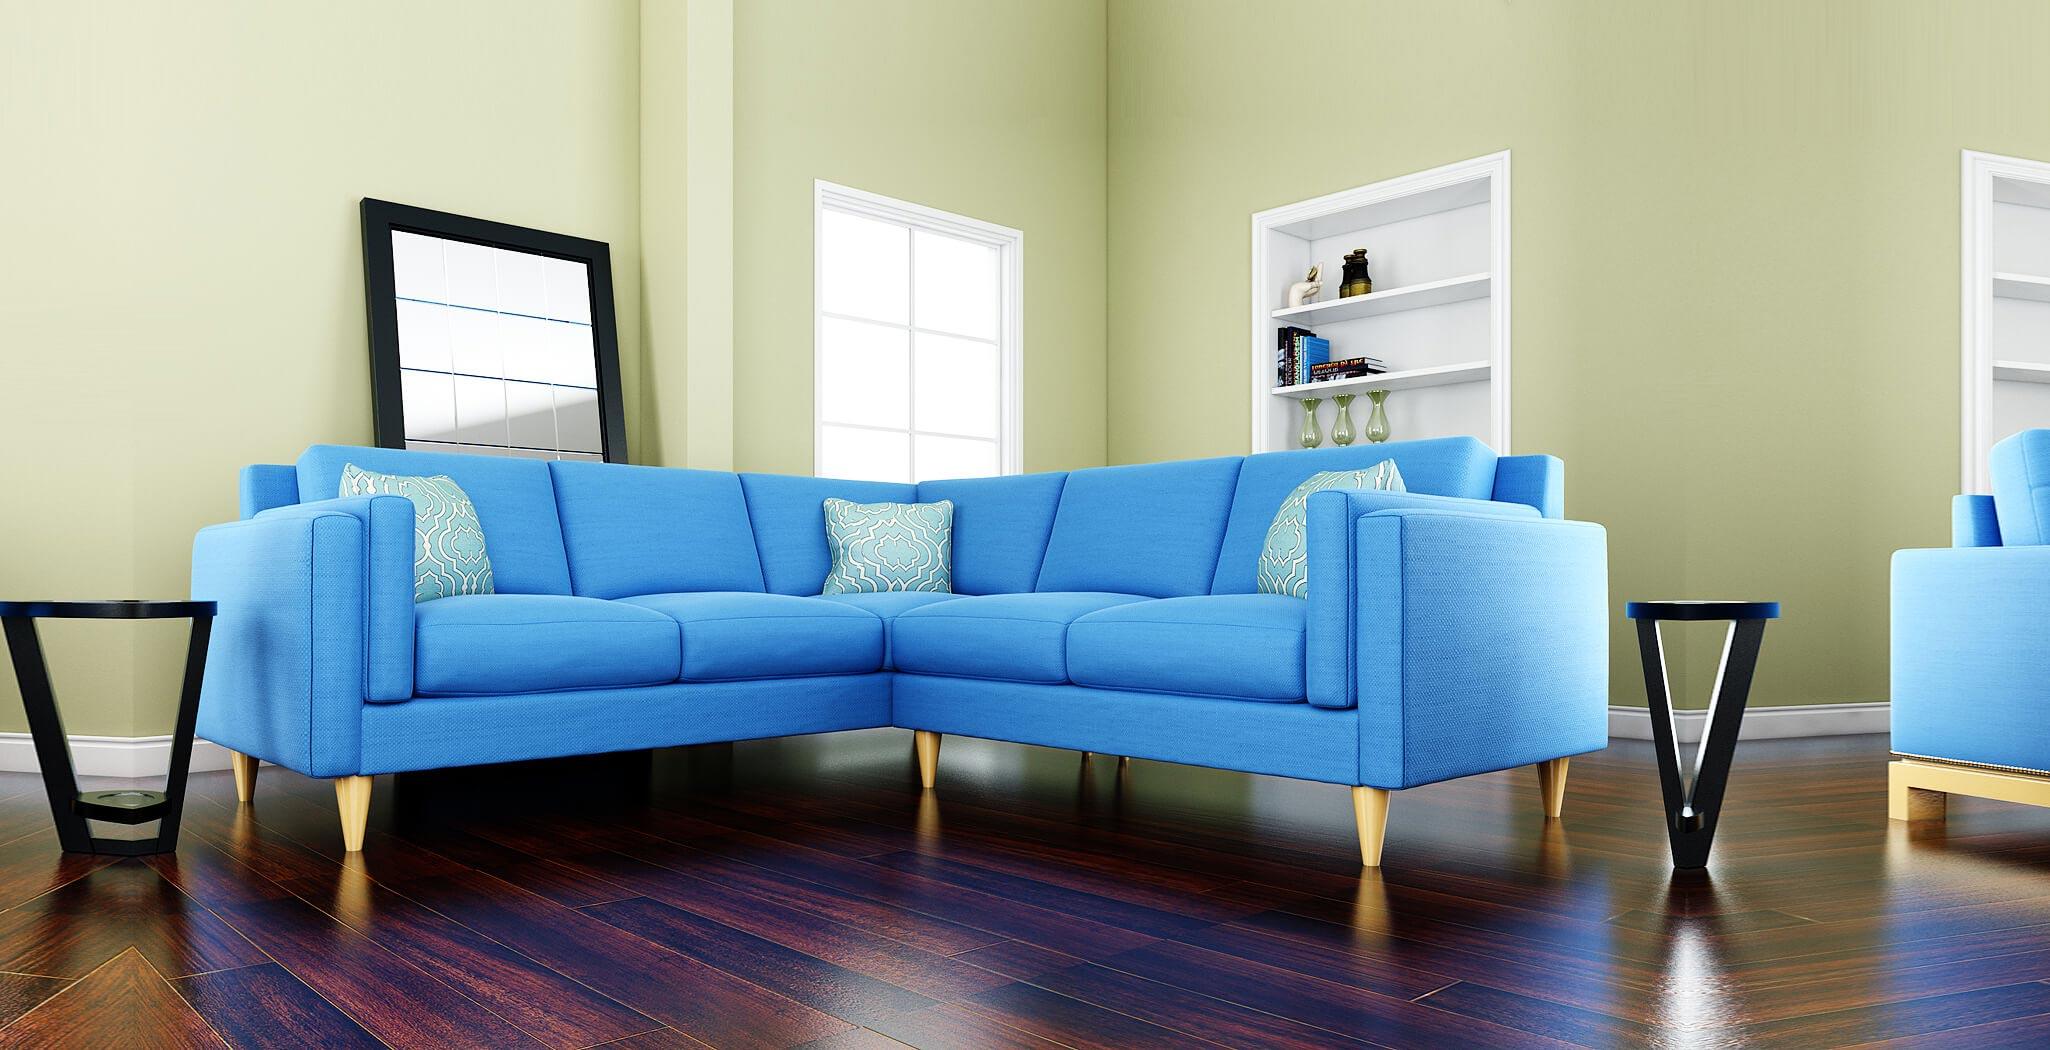 helsinki sectional furniture gallery 2